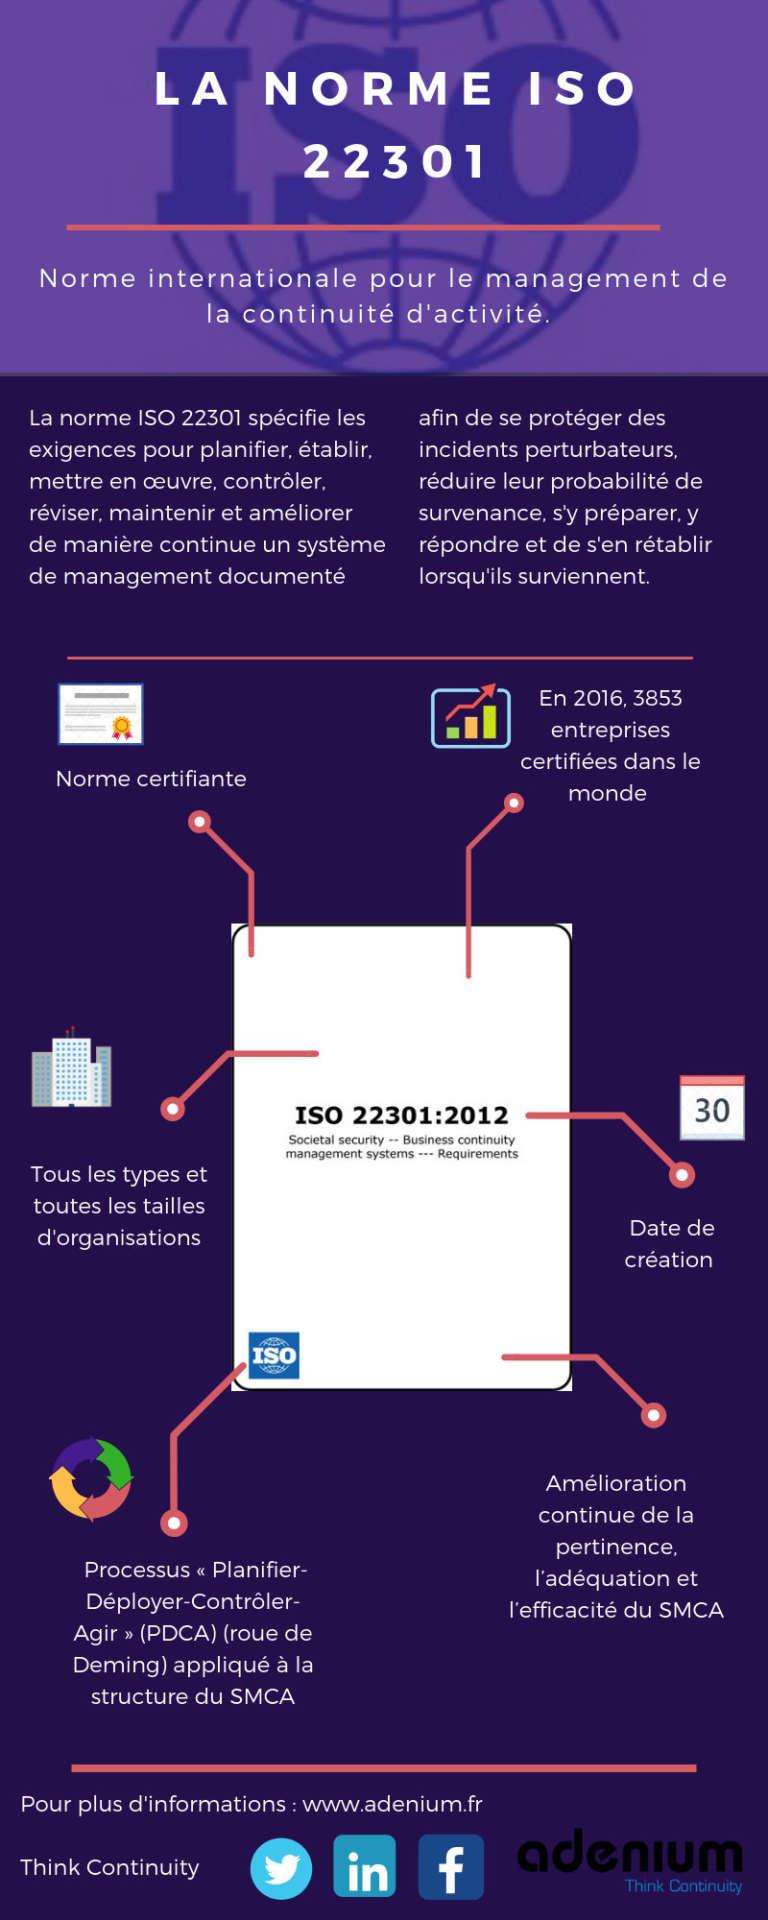 Infographie Adenium : PCA selon la norme ISO 22301